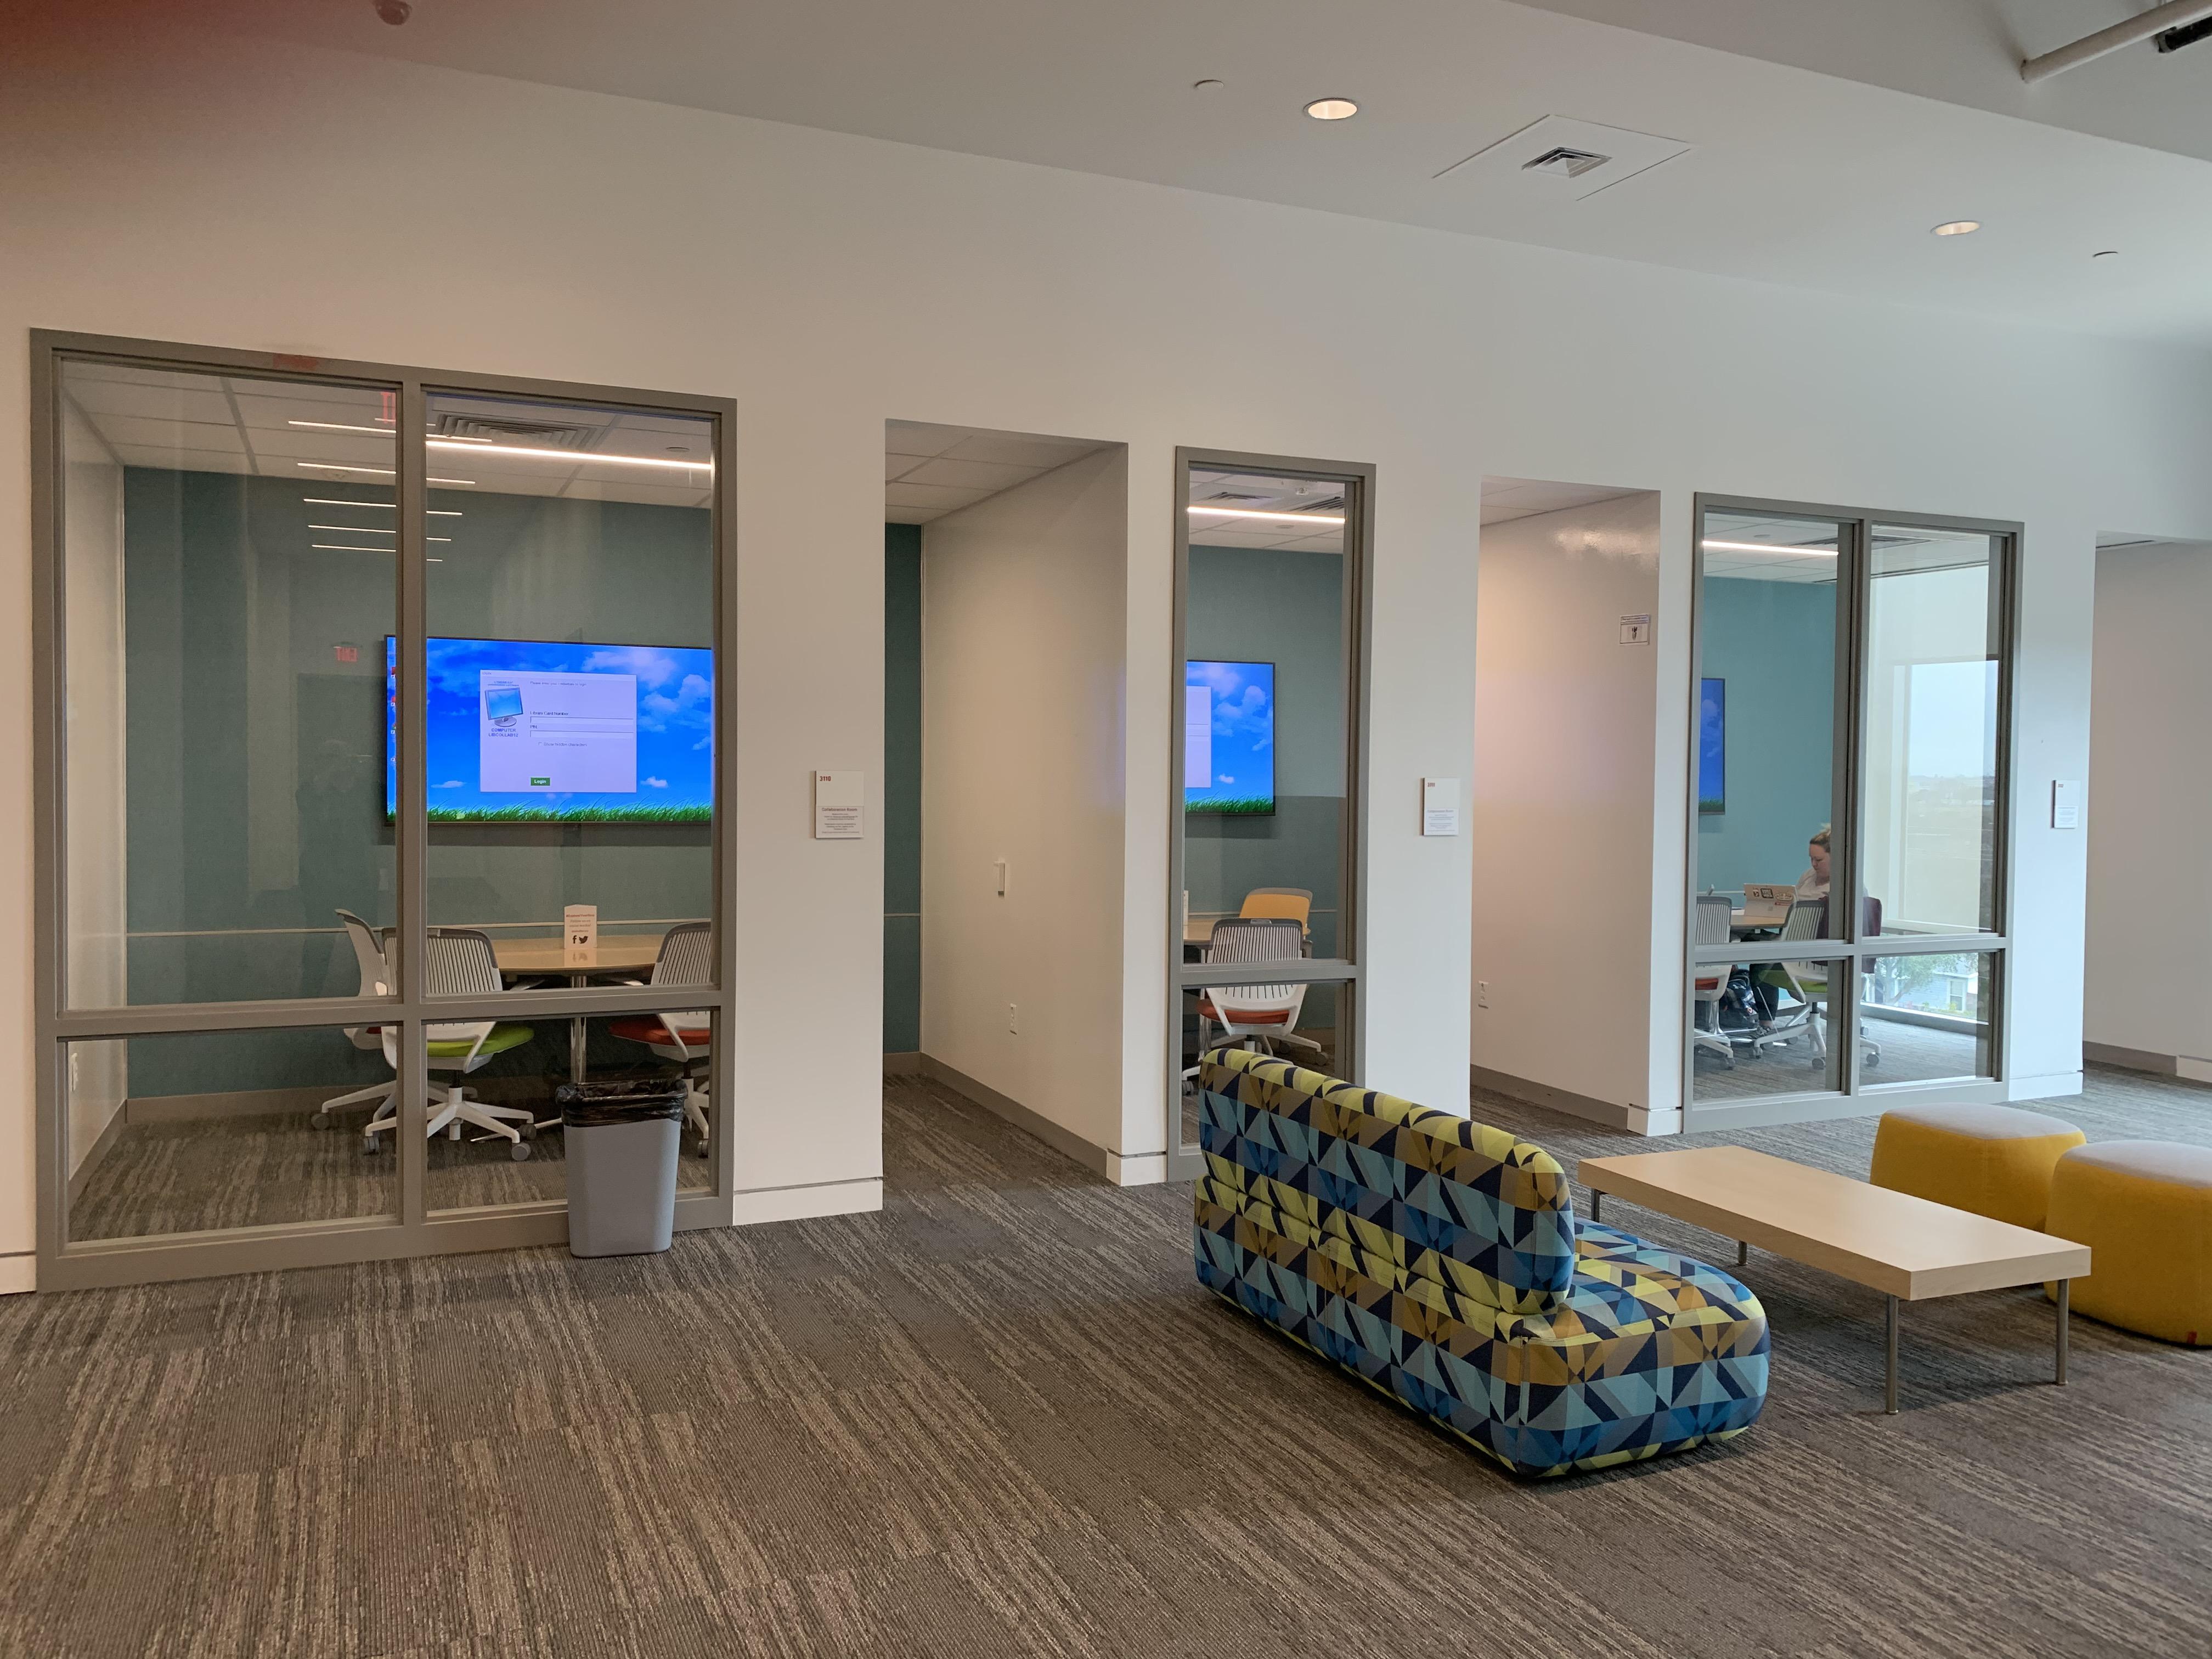 three study rooms with no doors